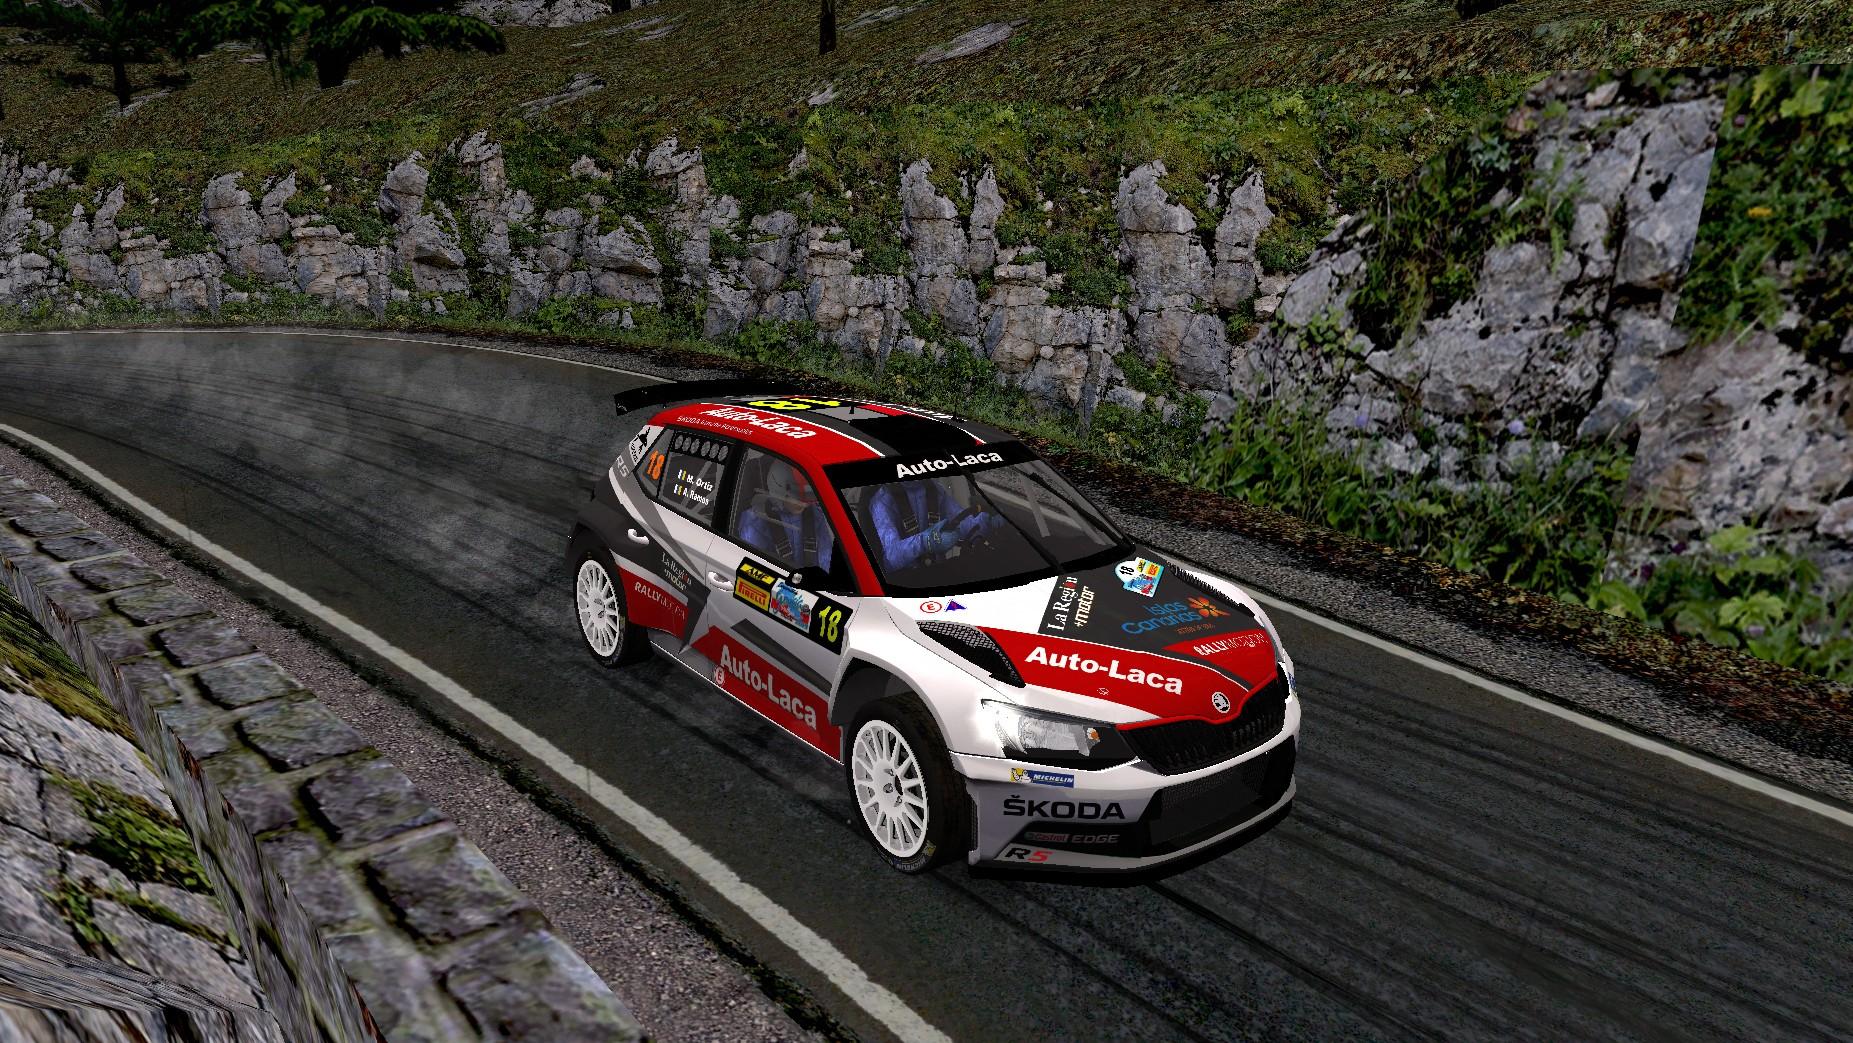 2. CGRV - Rallye De Noia - Página 2 IEL0pA